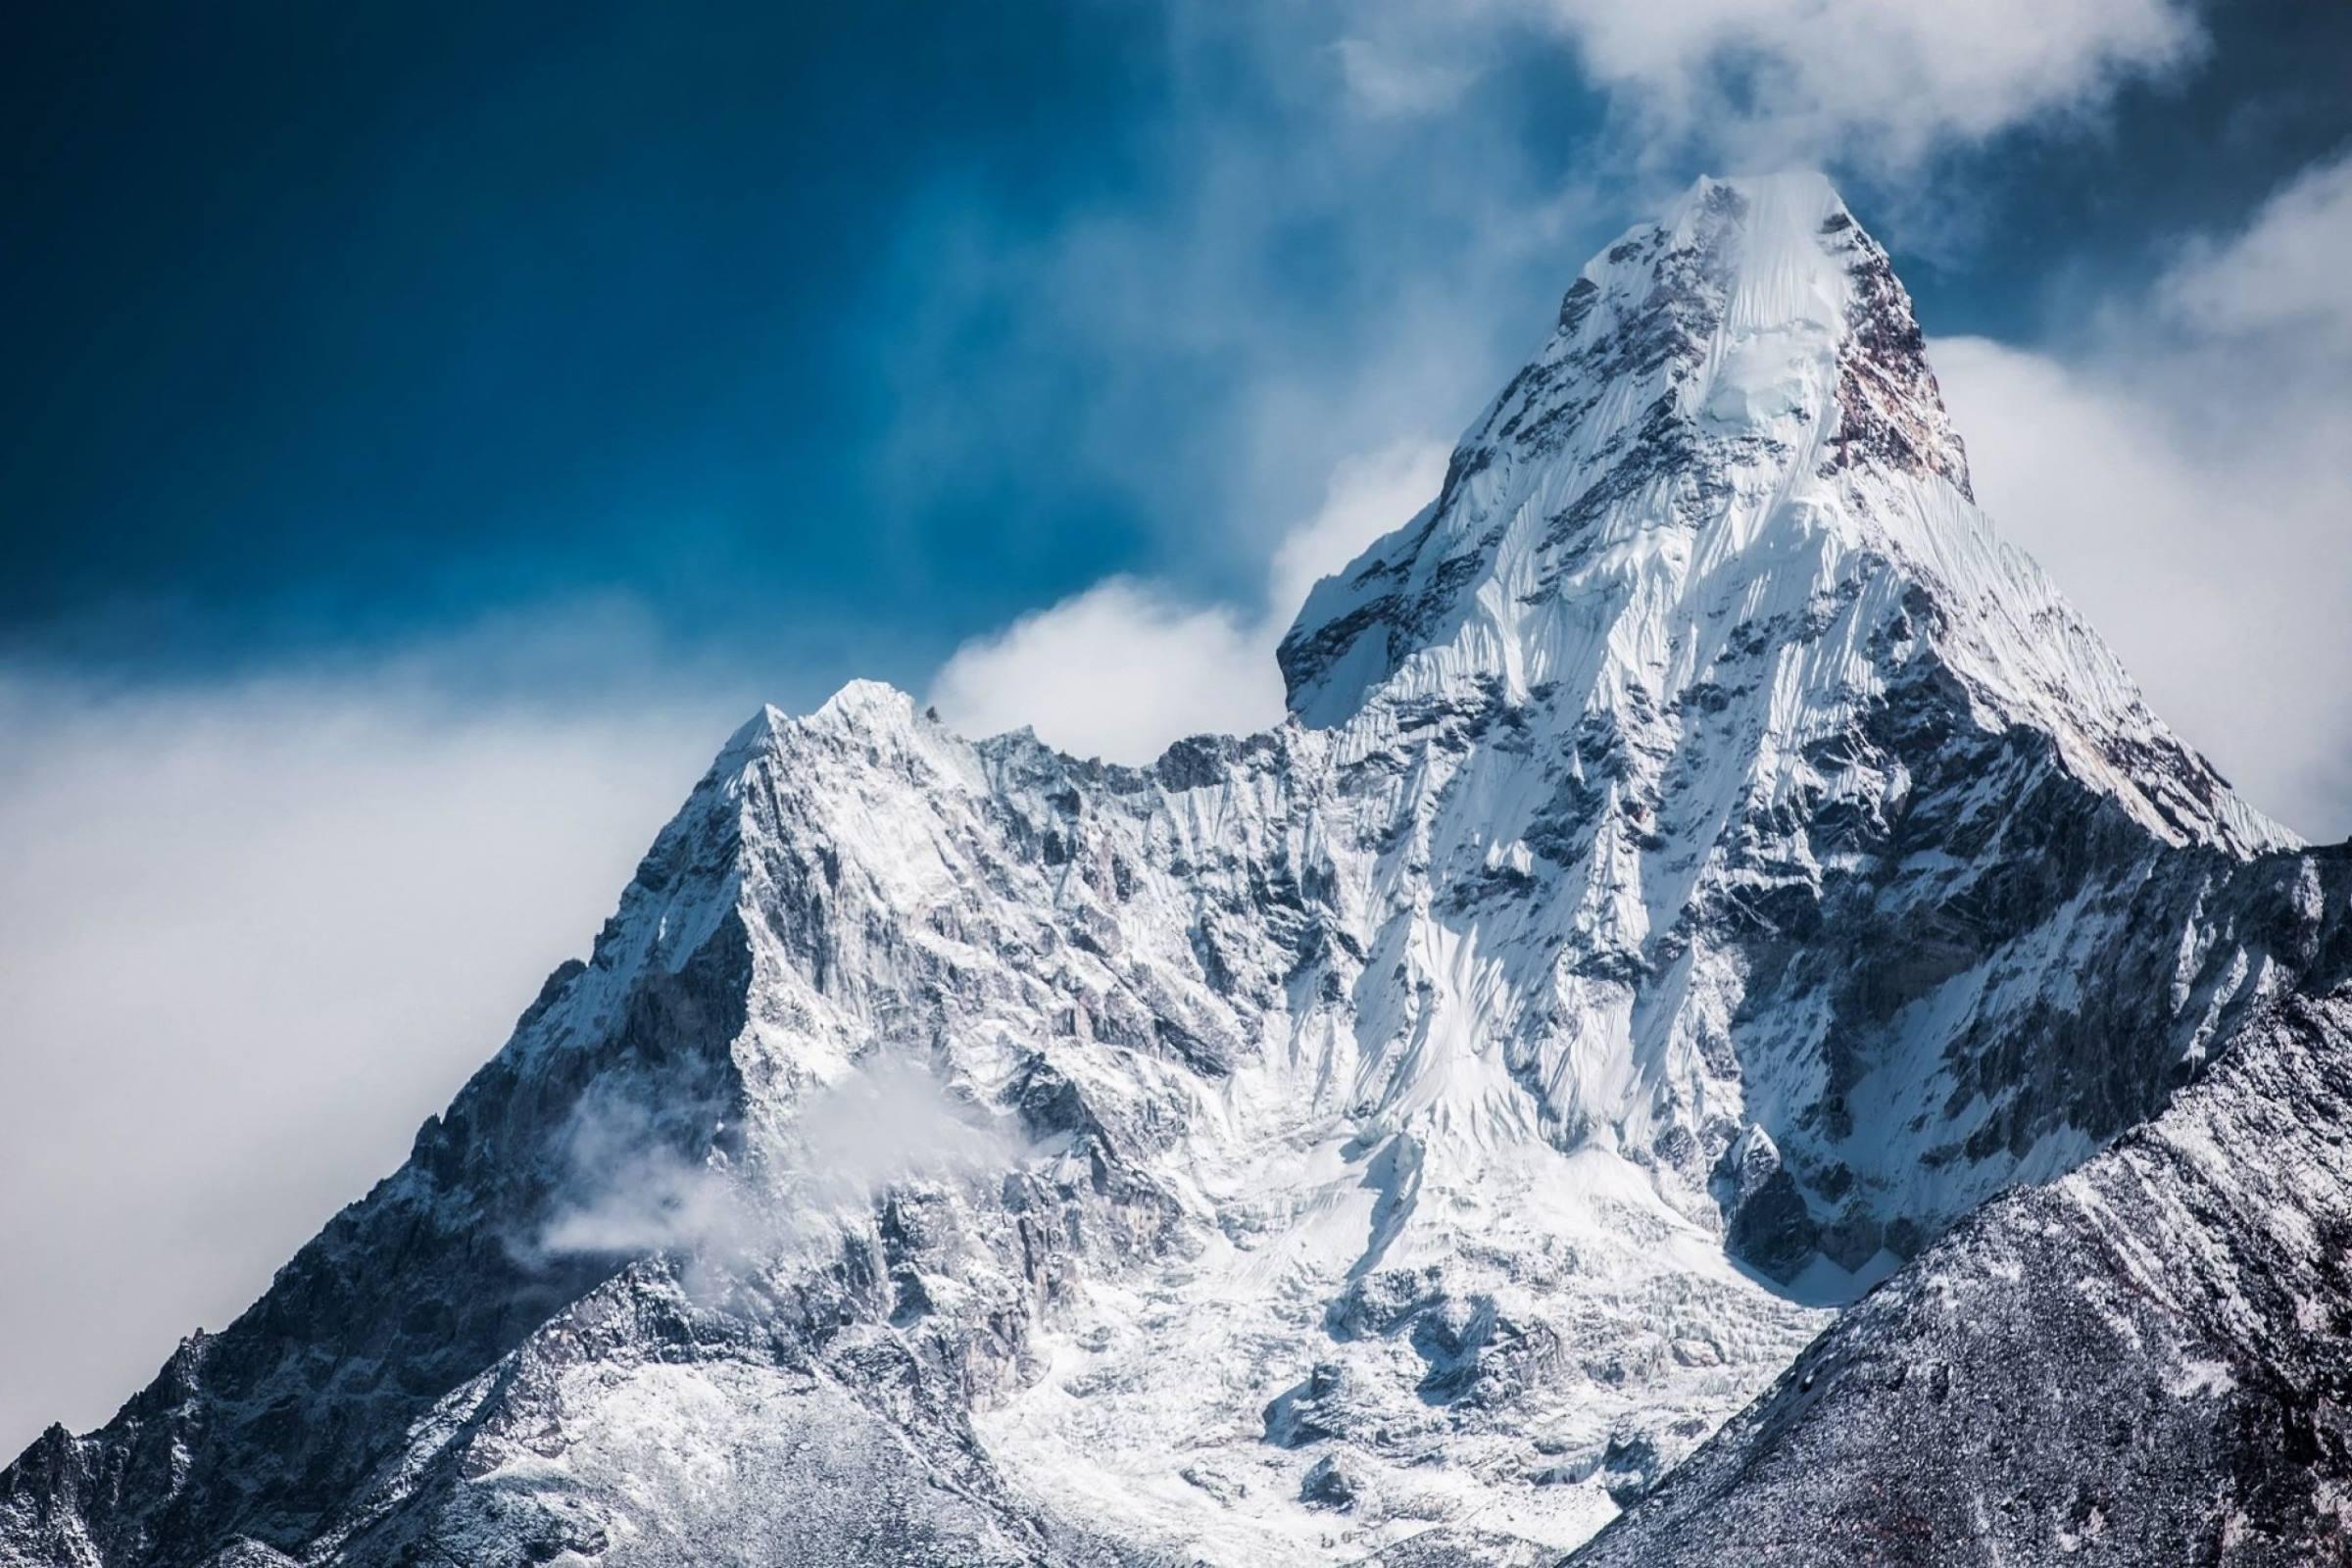 winter mountain ama dablam himalayas nepal